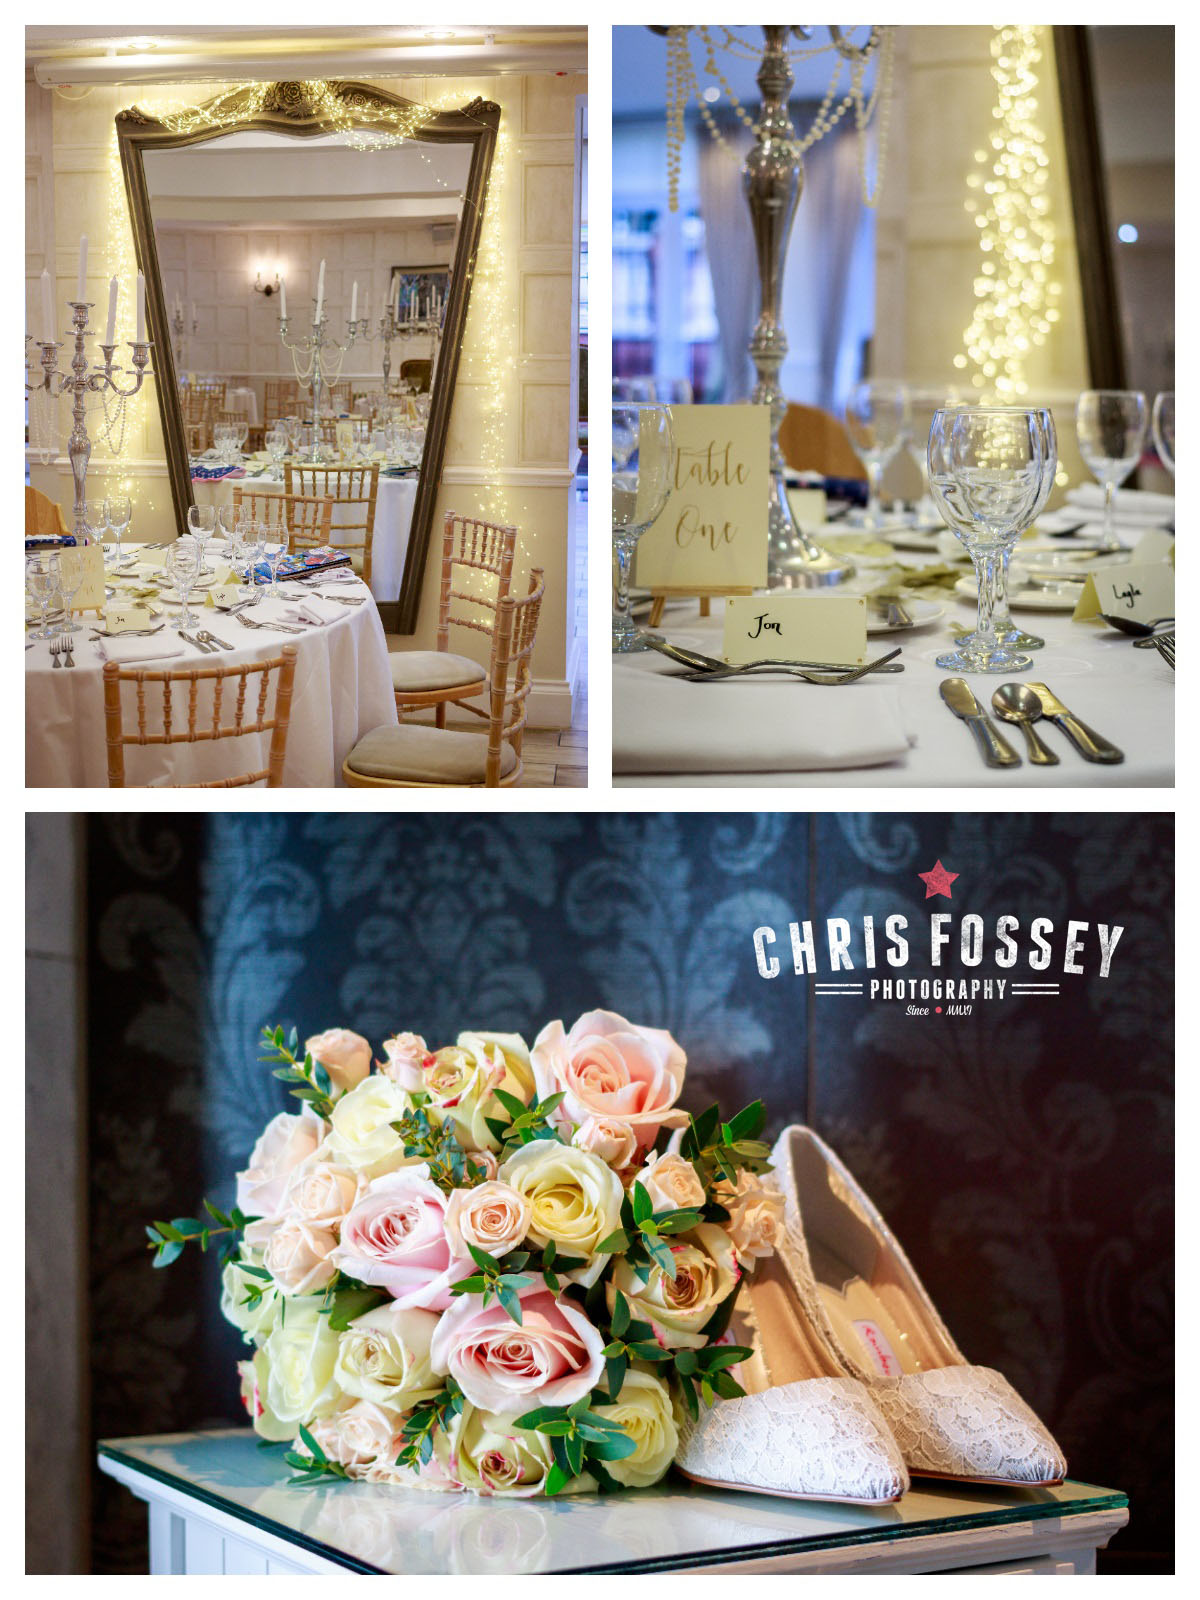 Nuthurst Grange Hotel Gorgeous Natural Wedding Photography Warwickshire Chris Fossey B94 5NL 04